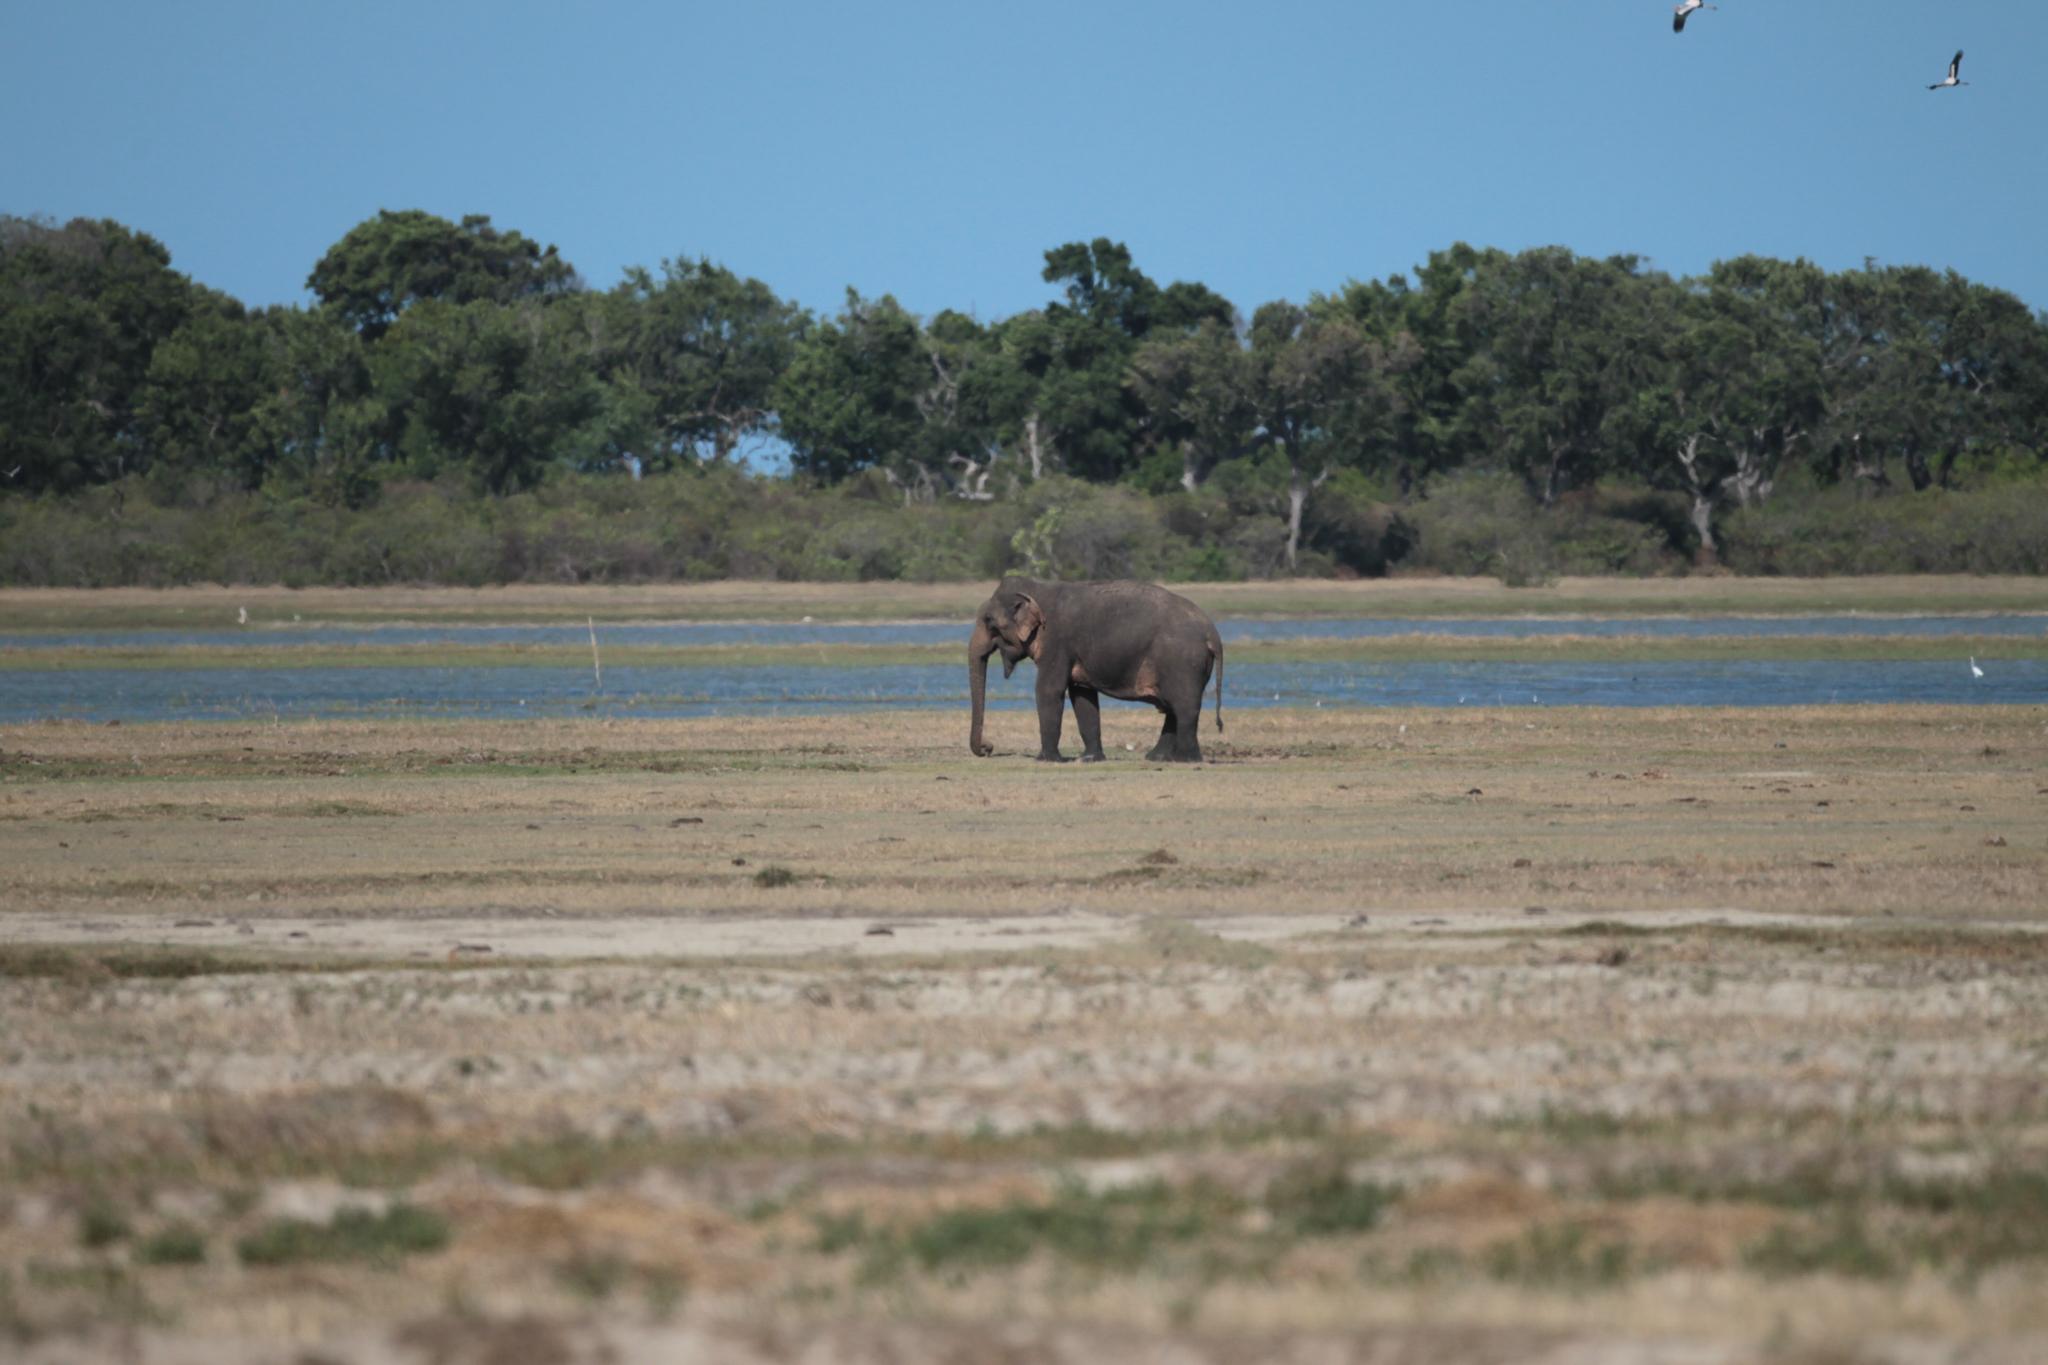 A wildlife park in Hambantota